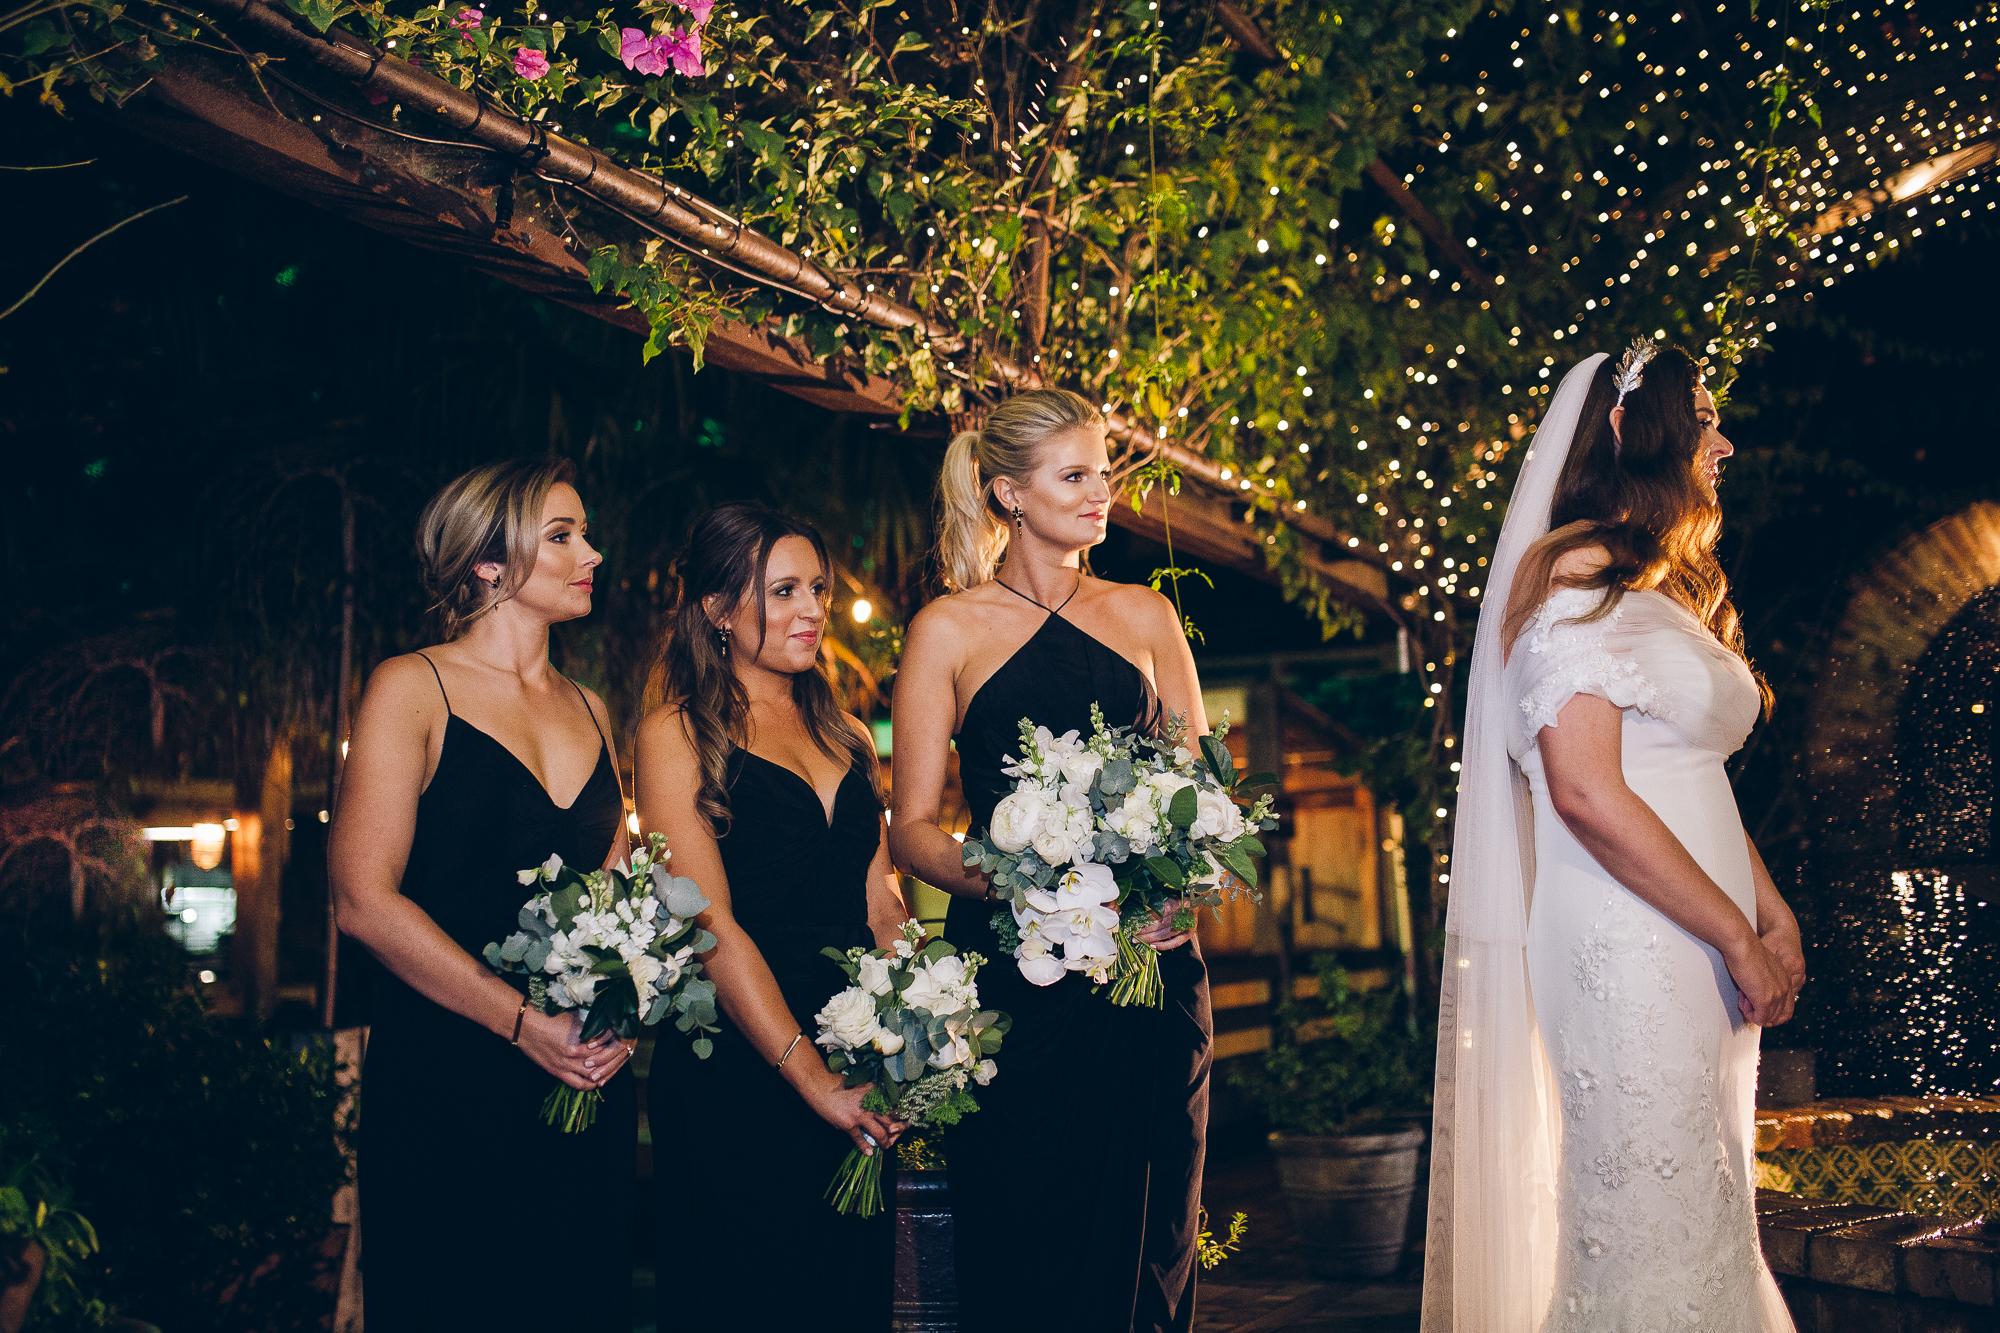 2065-Wedding-Ceremony-The-Grounds-Nicole-Brad.jpg